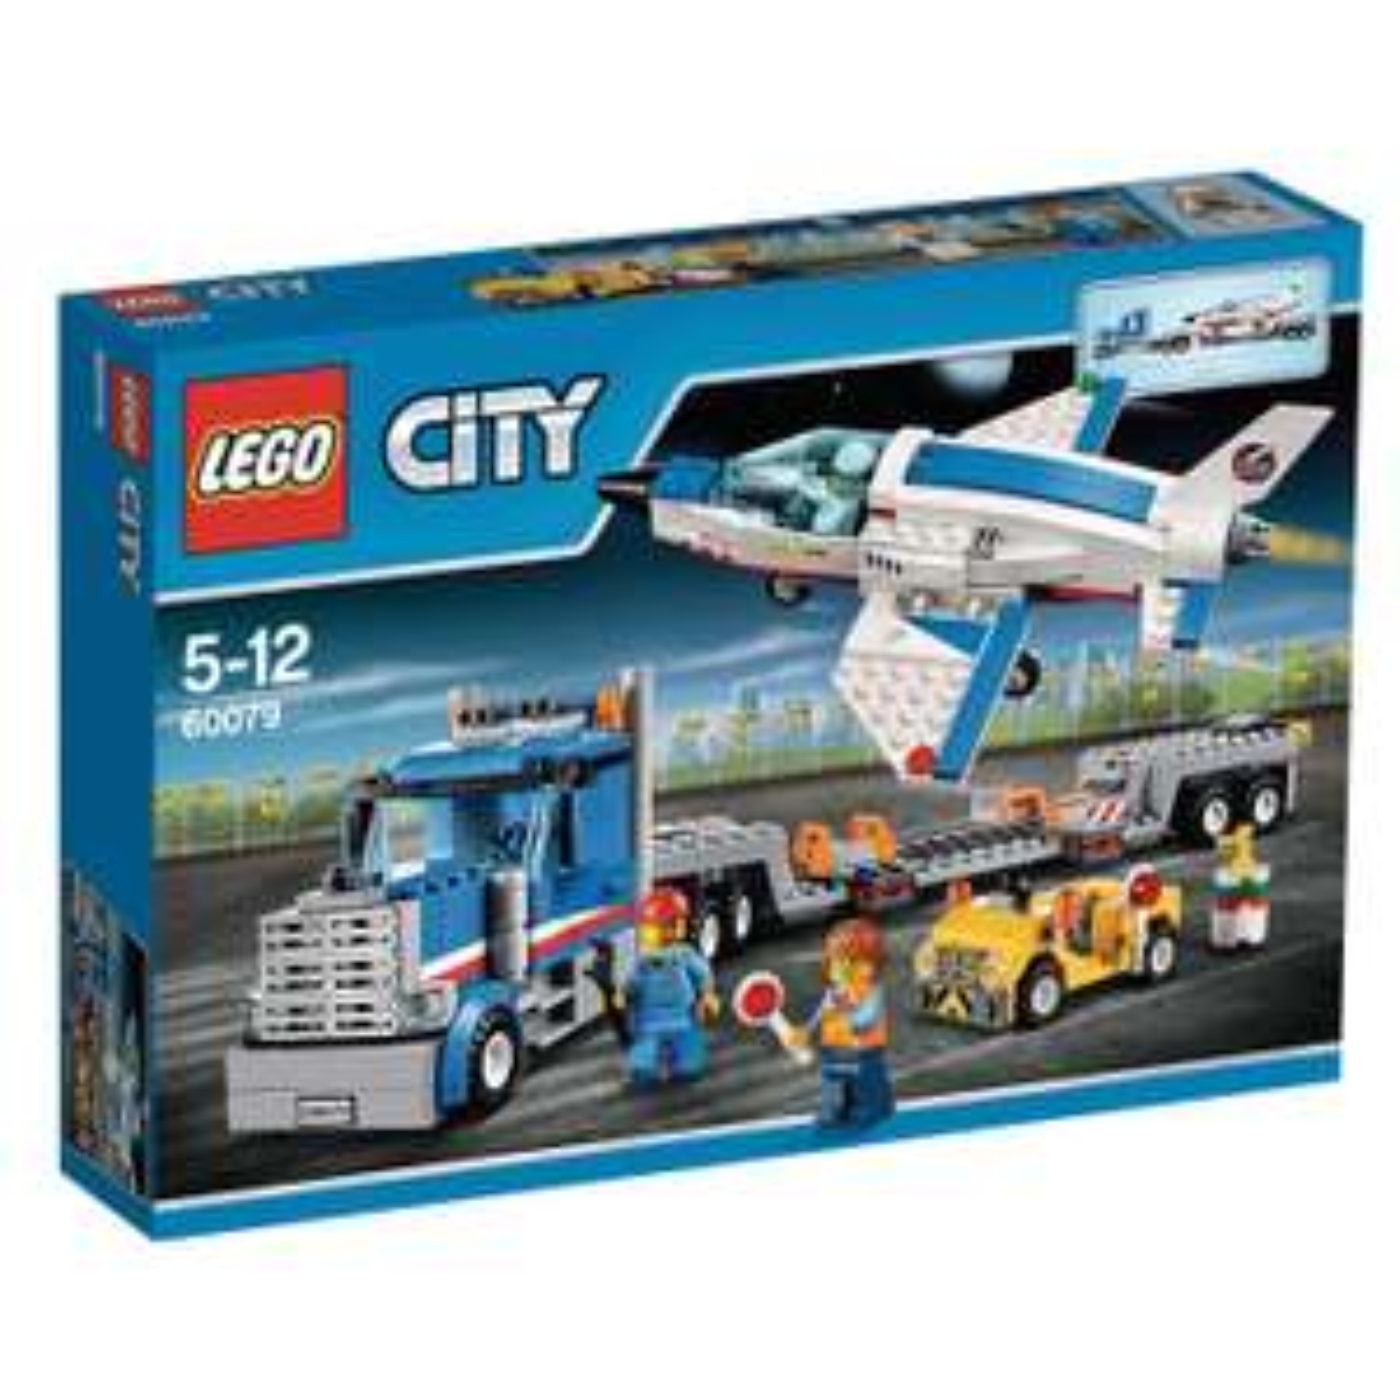 Lego City Weltraumjet mit Transporter 60079 für 29,95€ bei [Jako O]